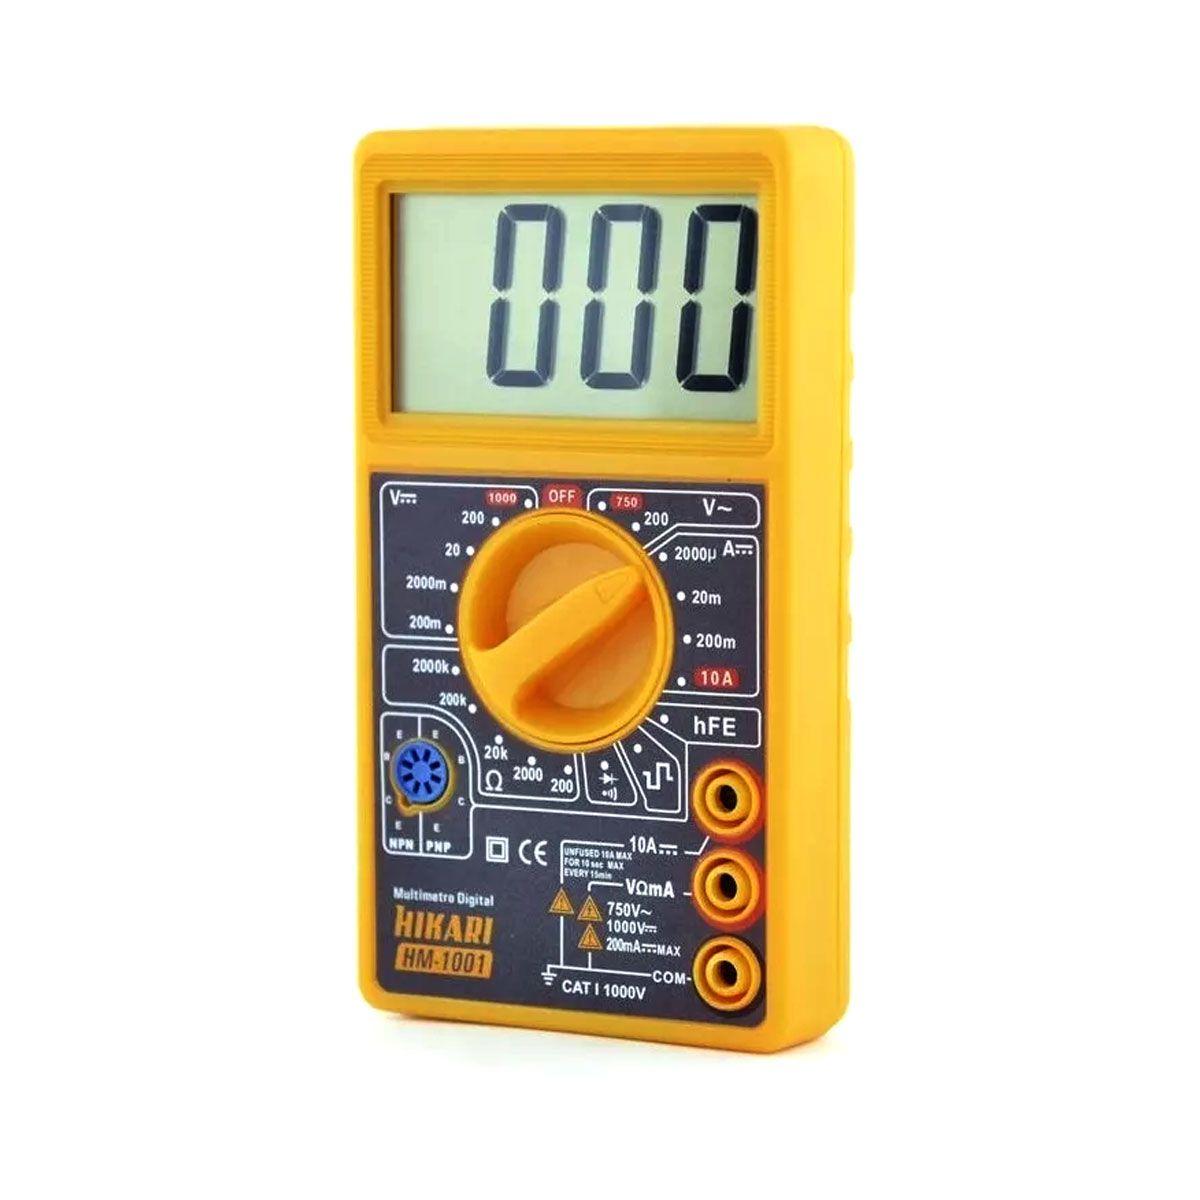 Multímetro Digital Hikari Hm 1001 / HM1001 com LCD e Beep;